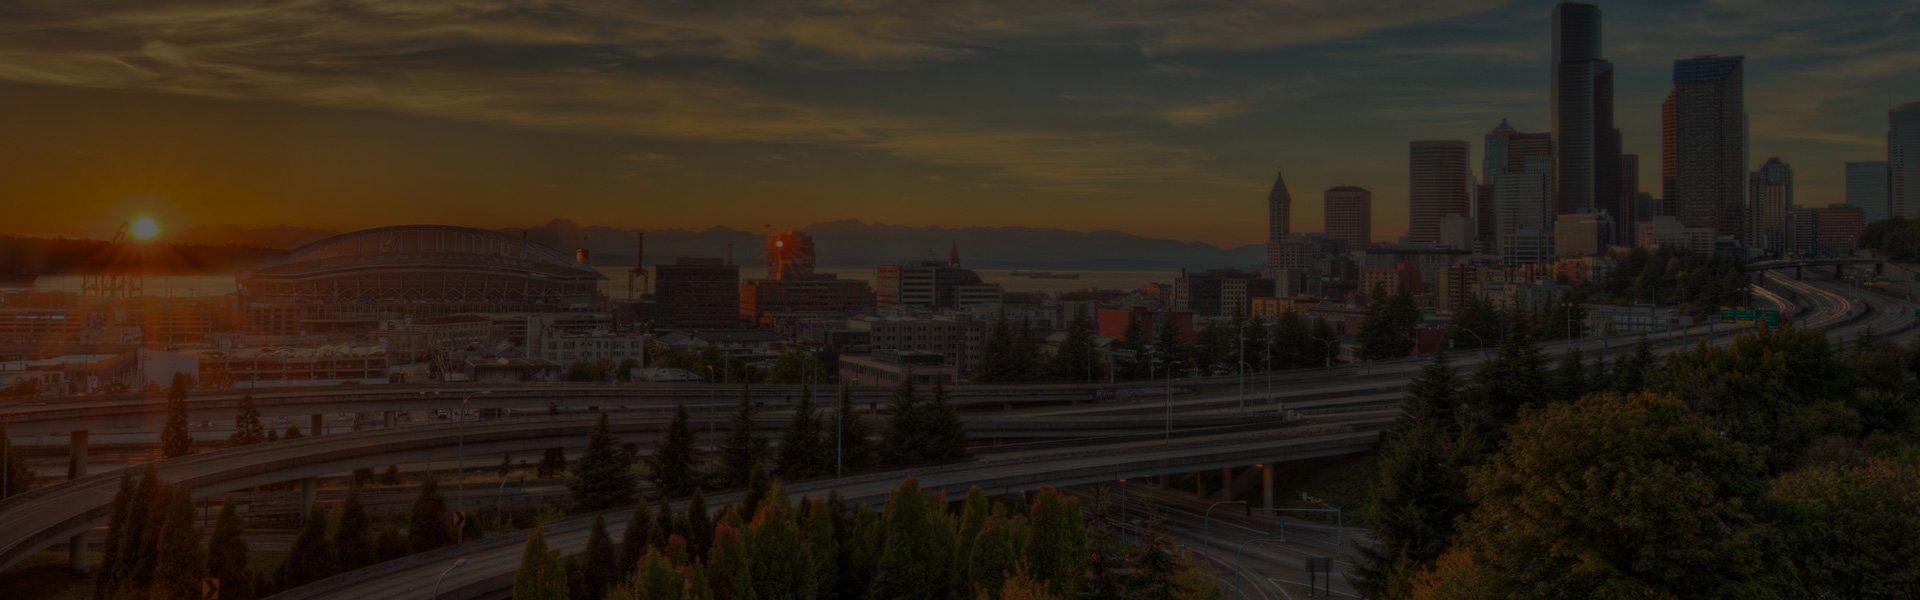 Tacoma Attorneys Location Background